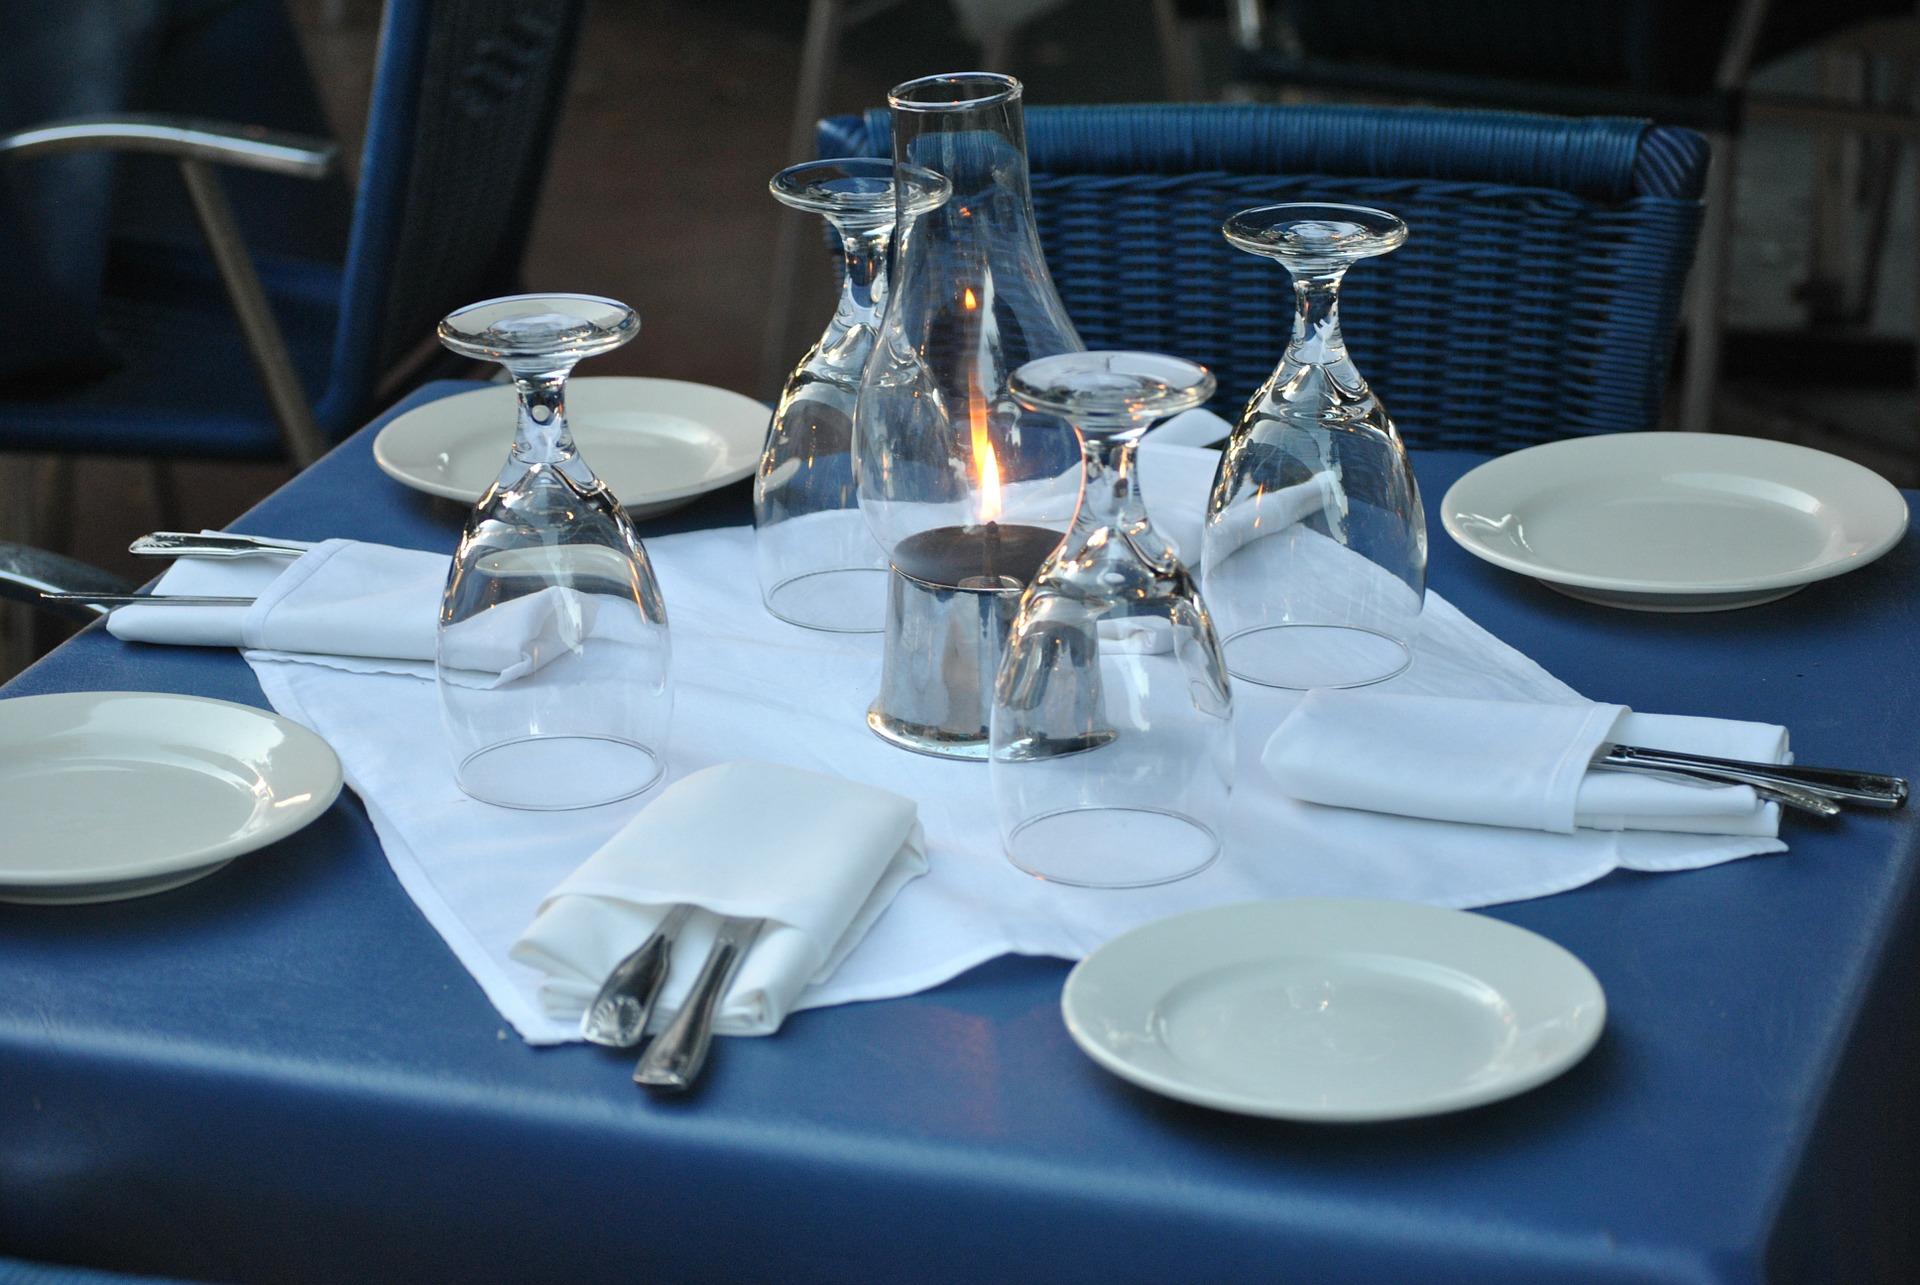 restaurant-18311_1920